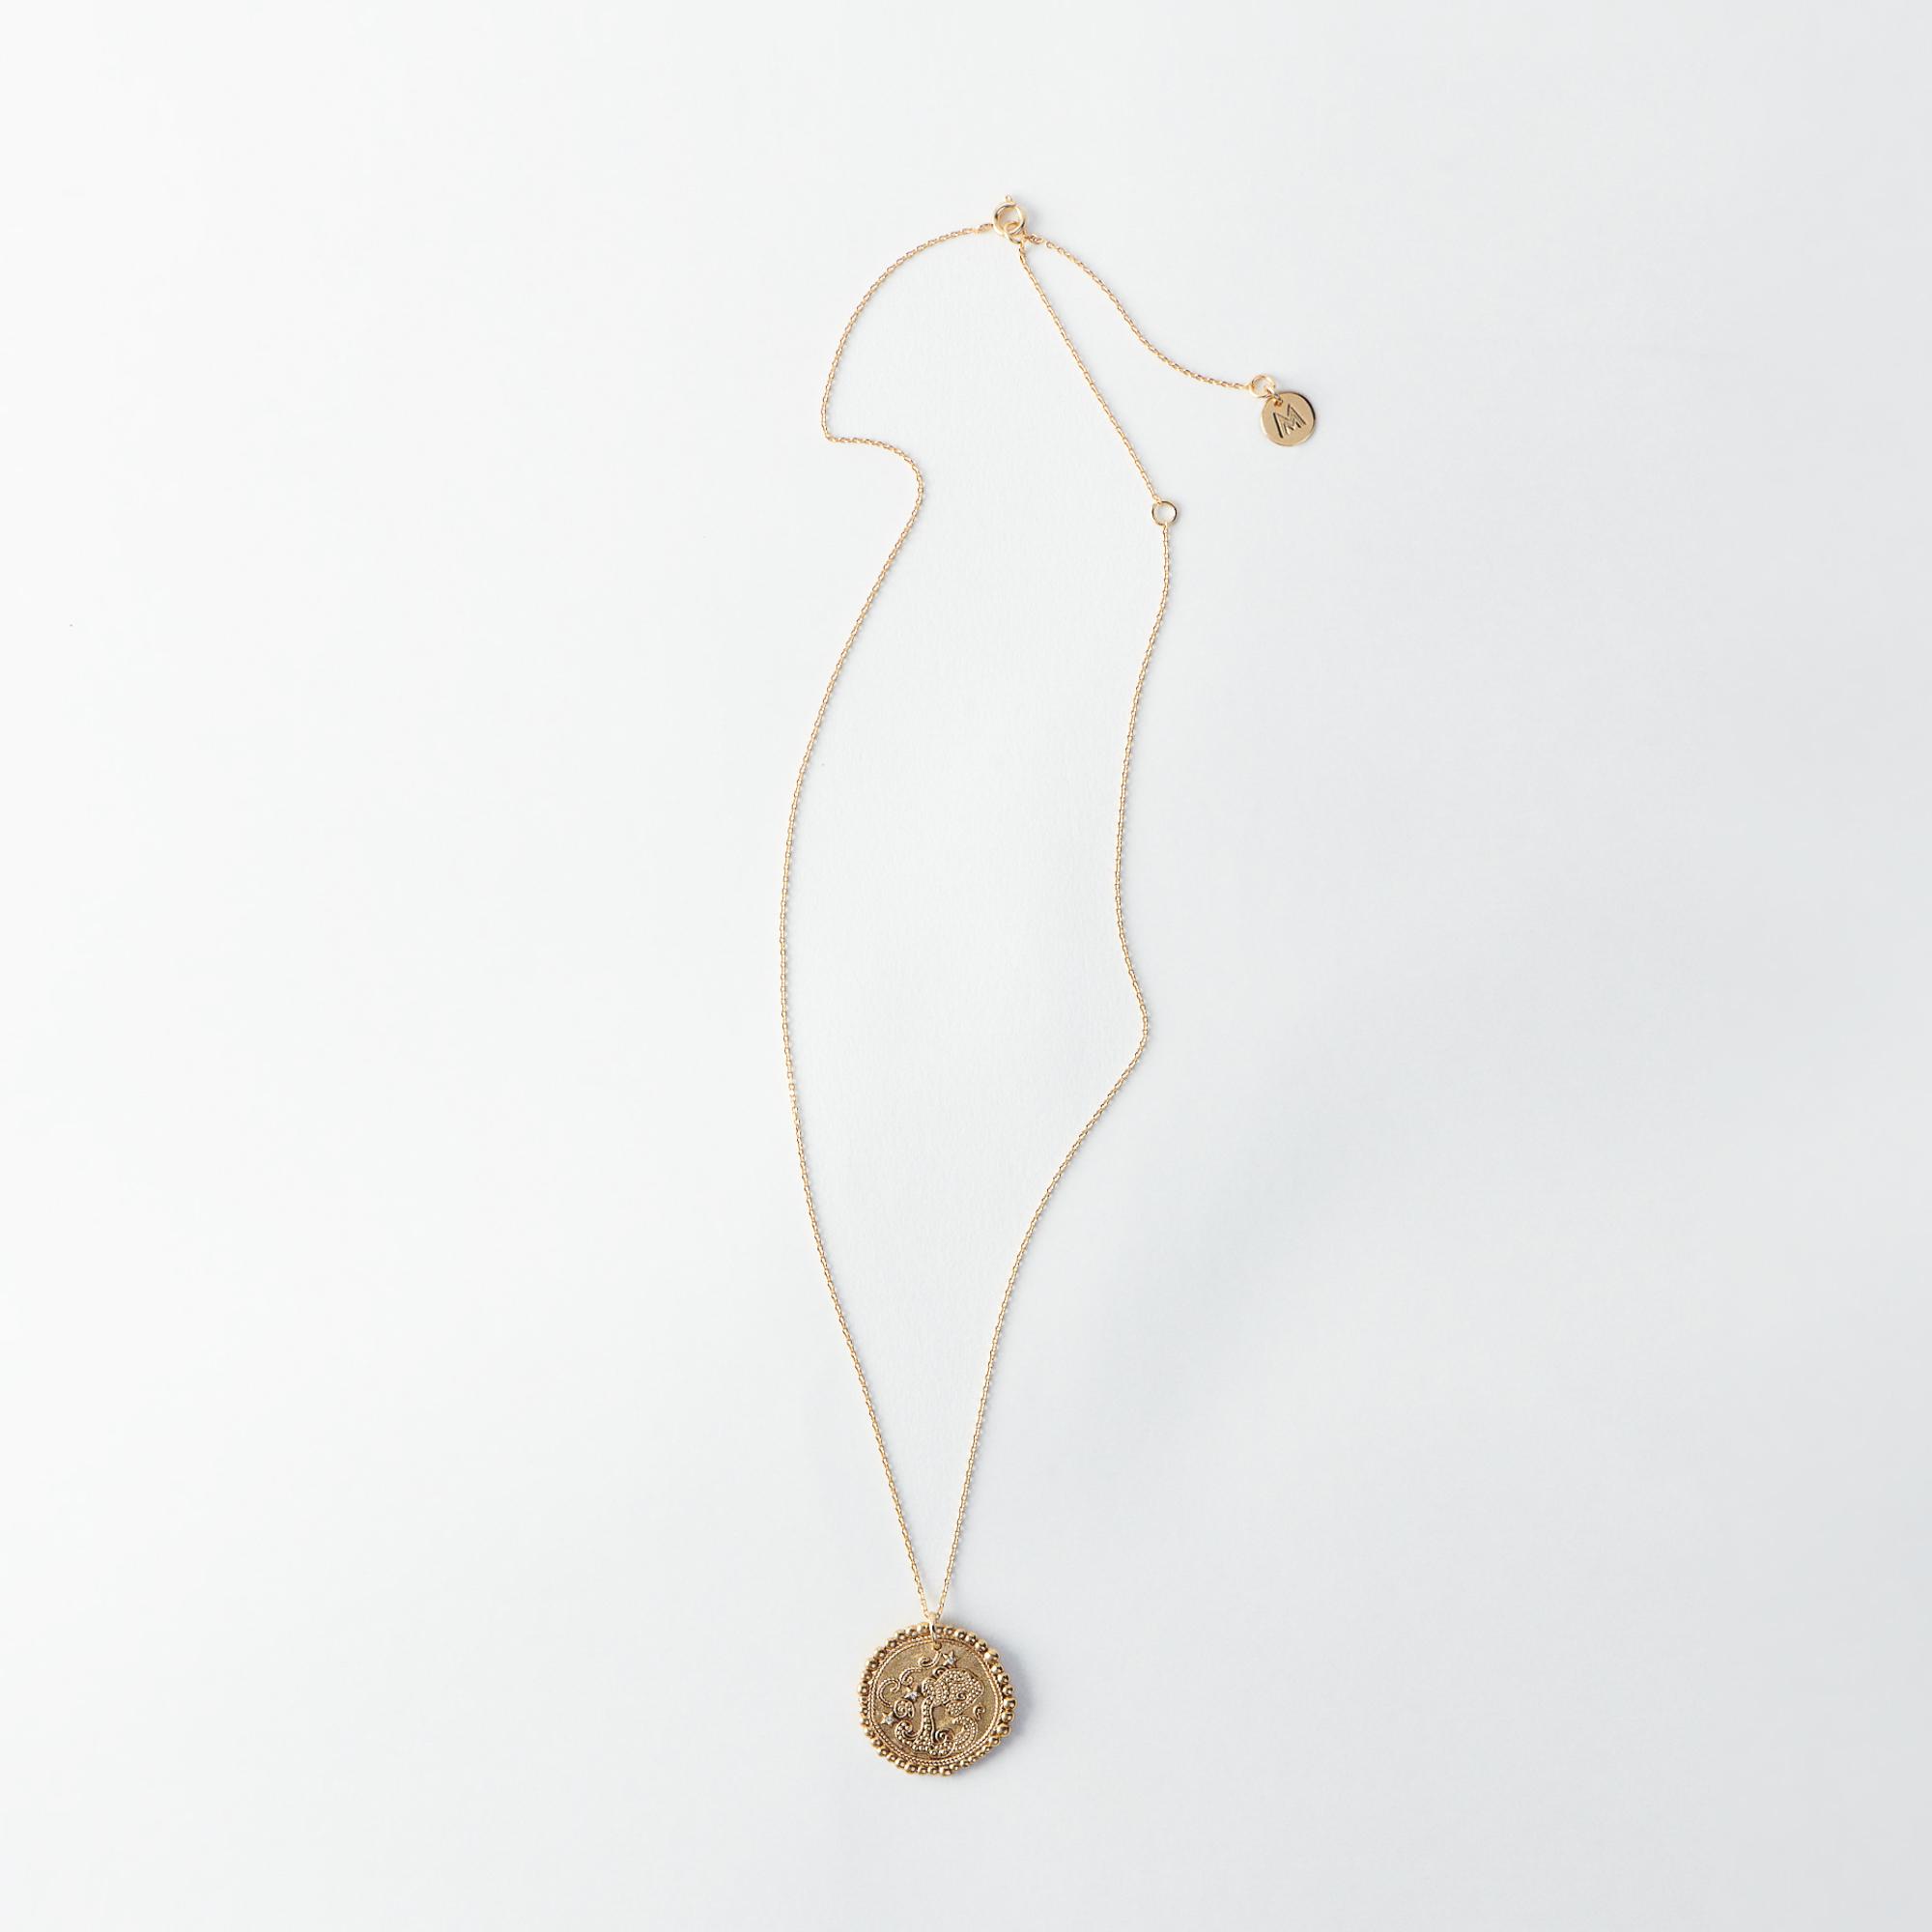 Aquarius Zodiac Necklace - Gold